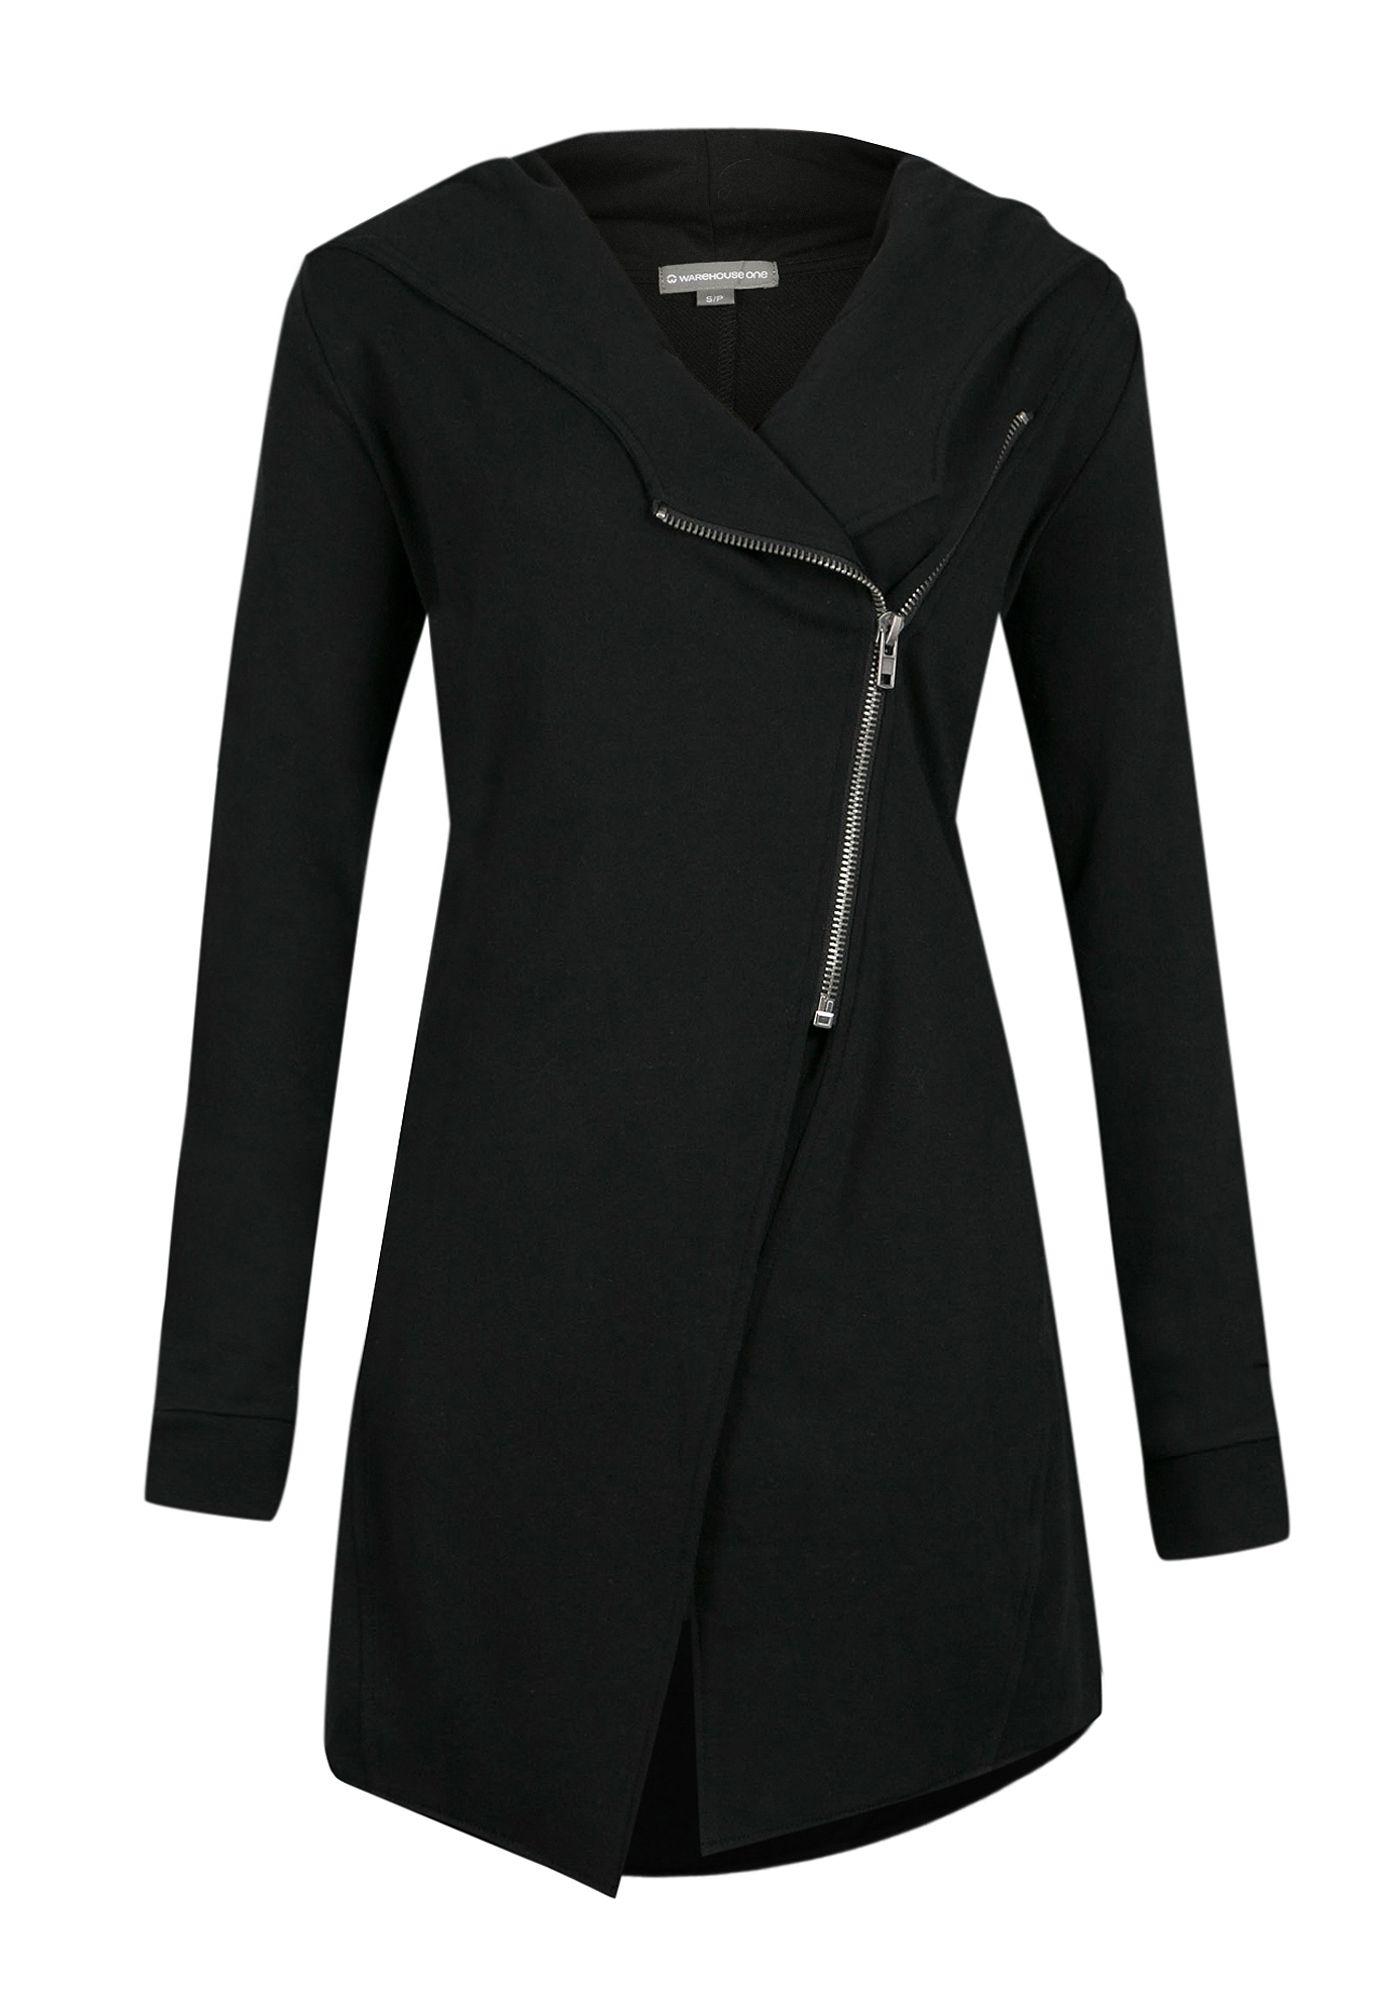 Ladiesu fleece jacketladiesu fleece jacket black clothing pinterest